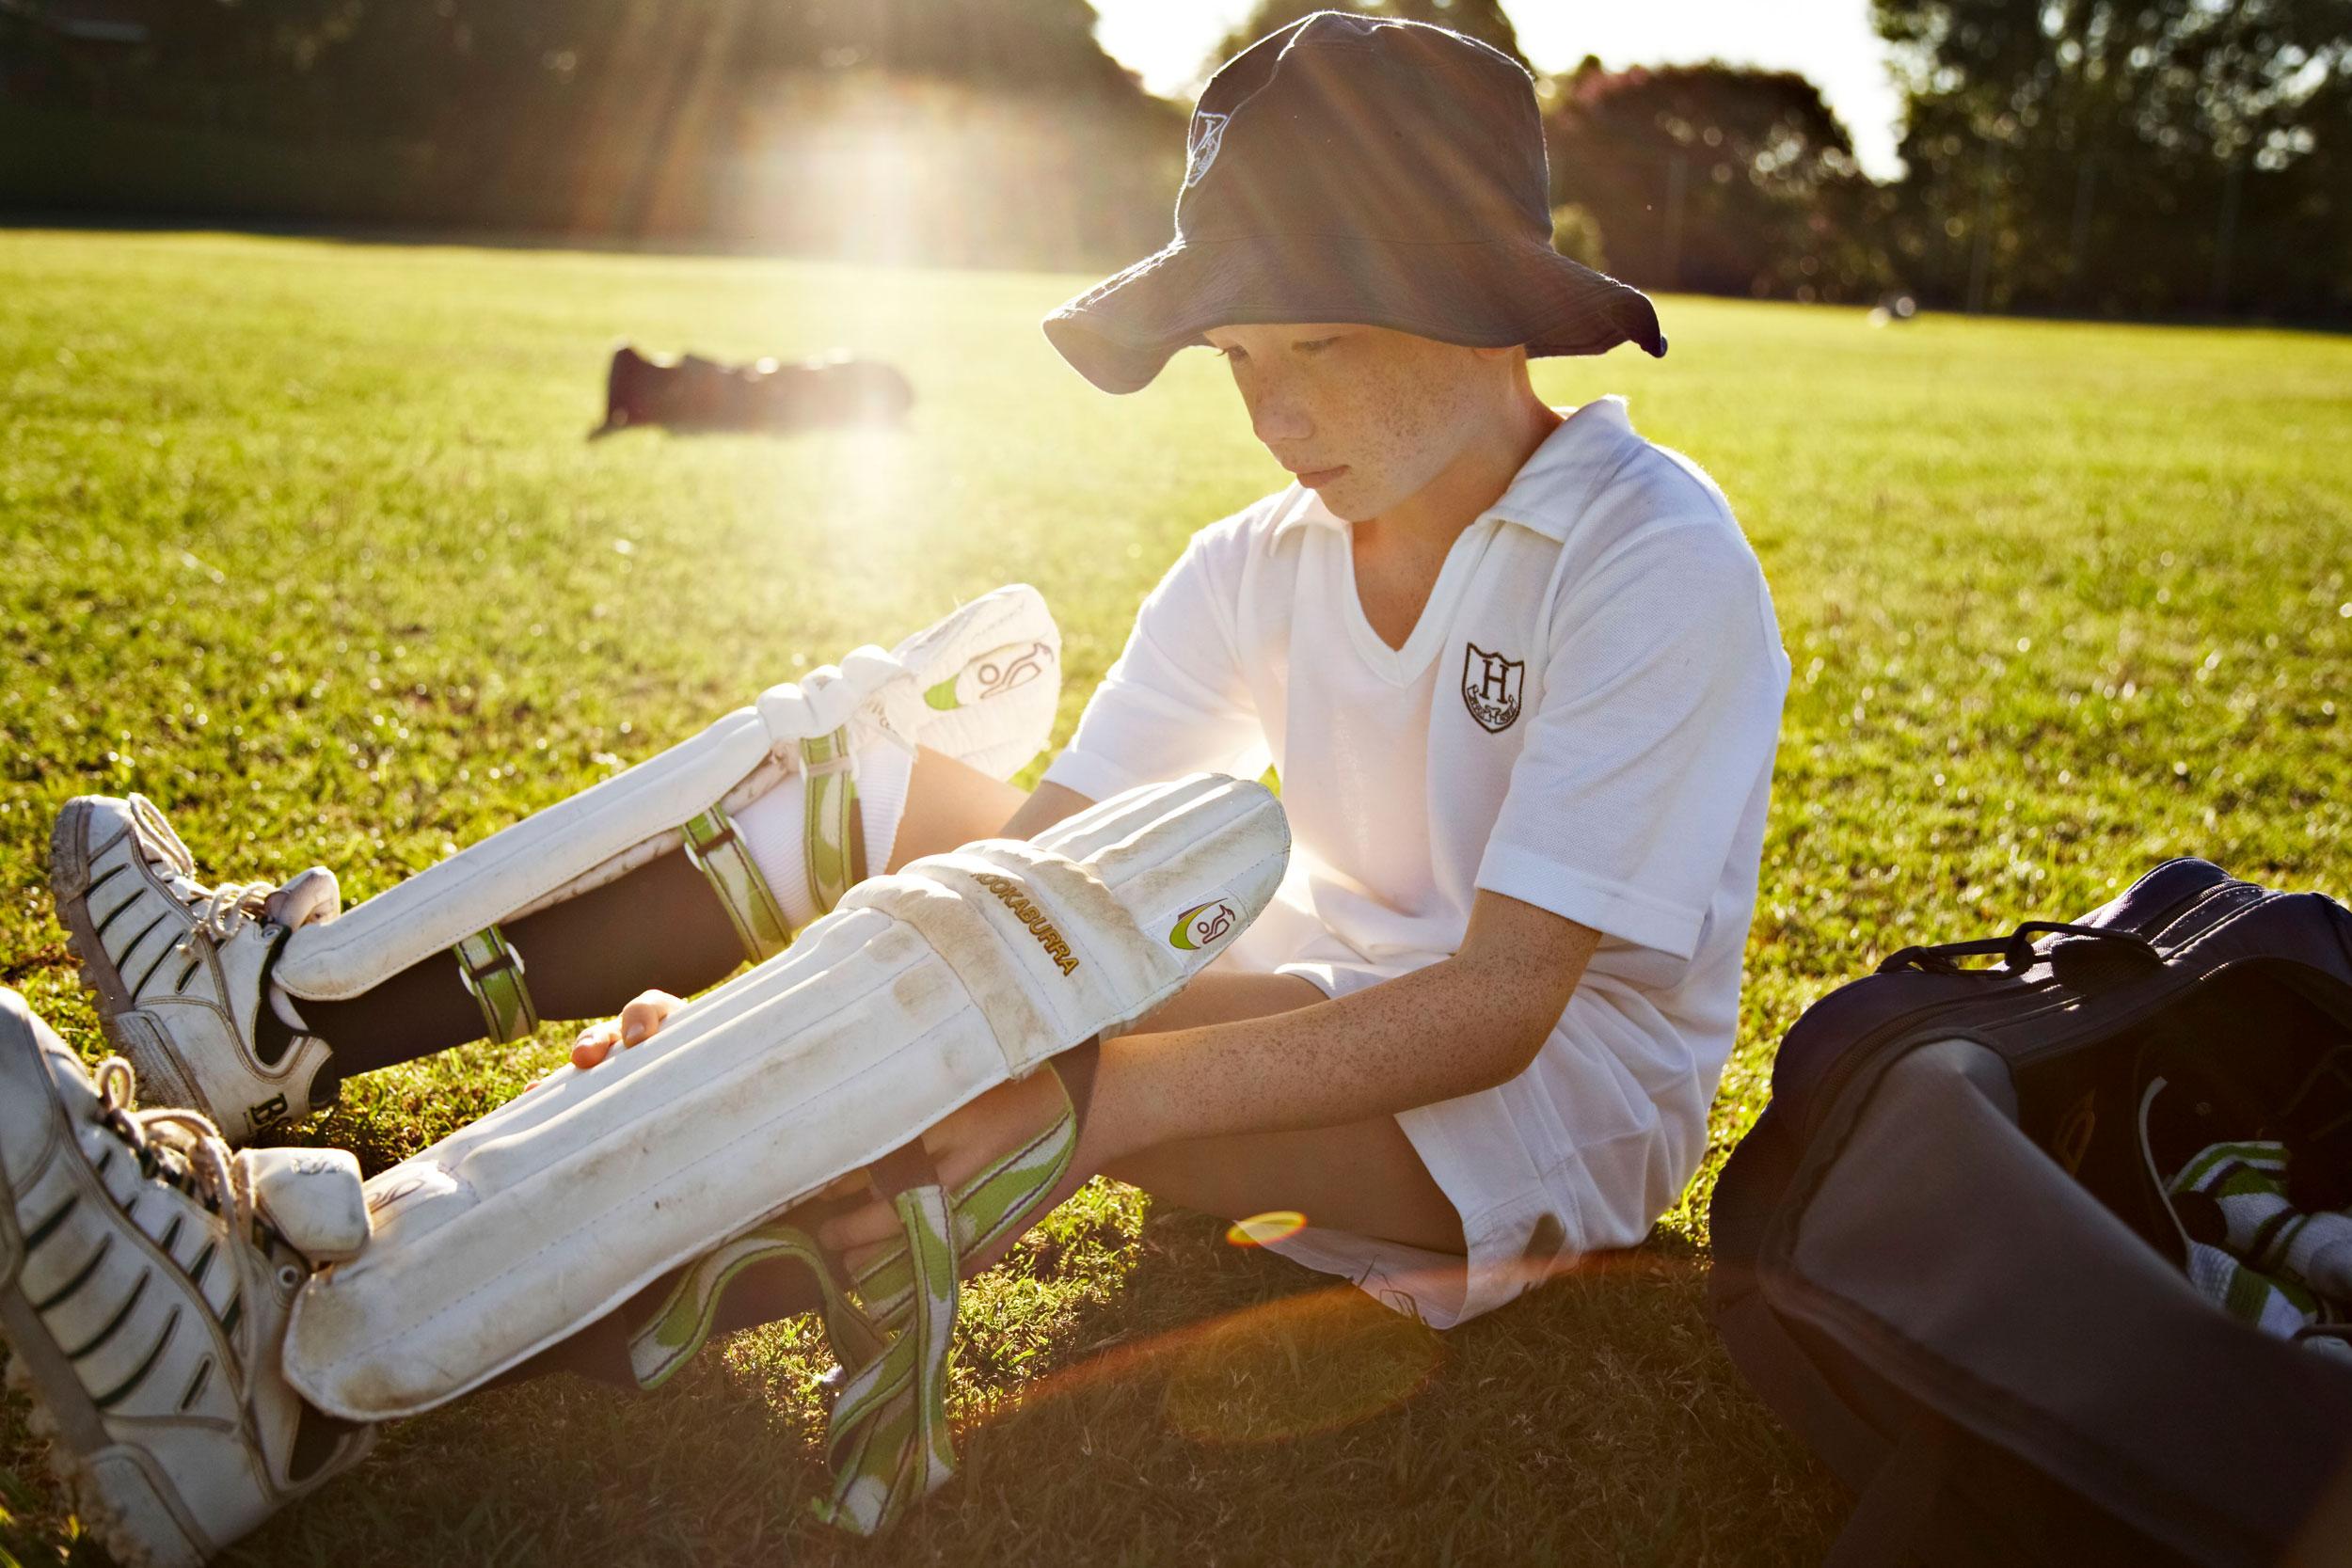 20070319_Cricket_B8T2662.jpg